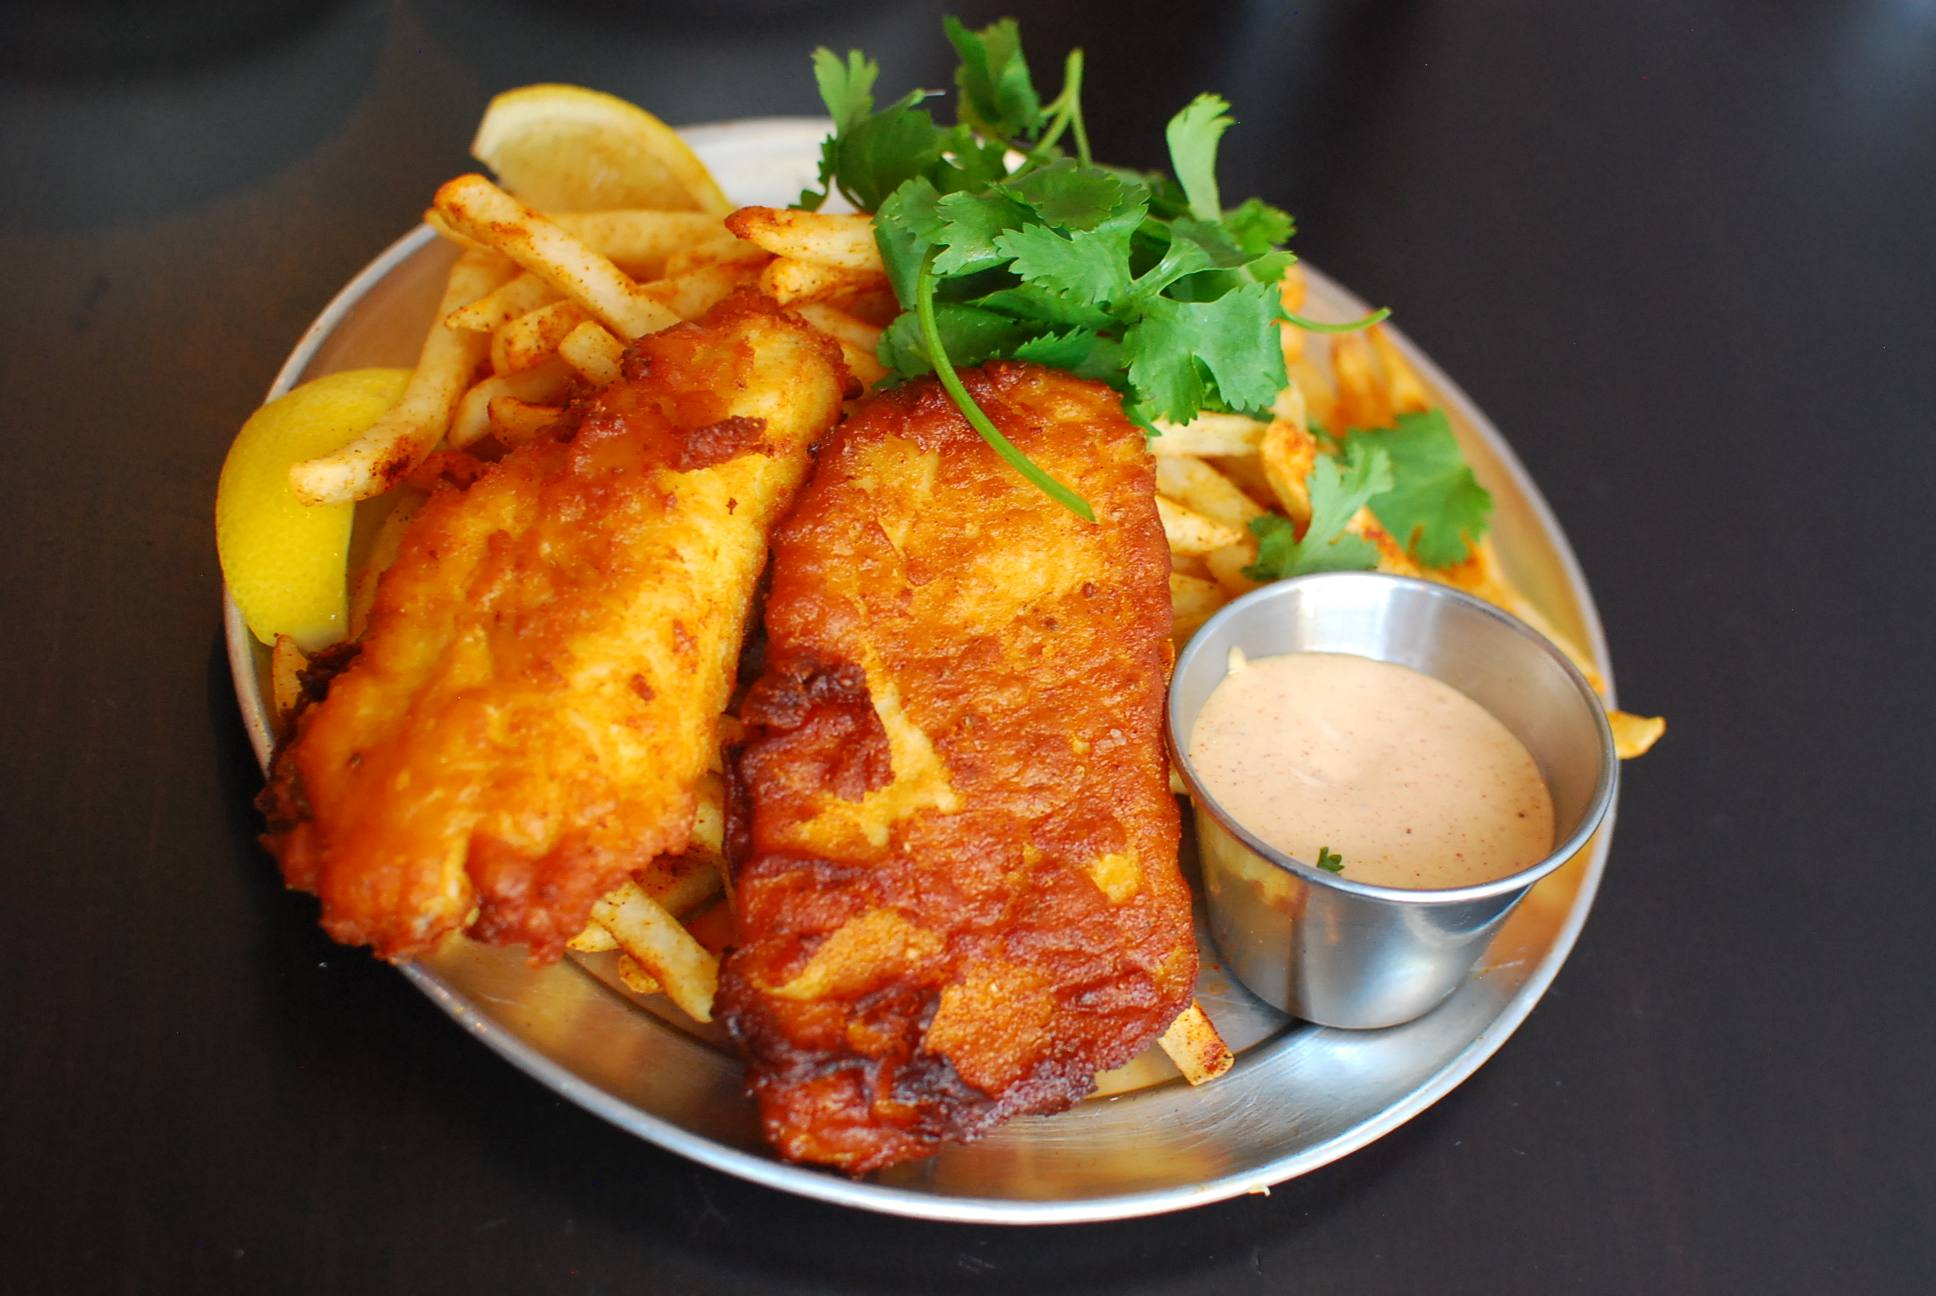 Punjabi fish and chips at Badmaash | Photo: Joshua Lurie